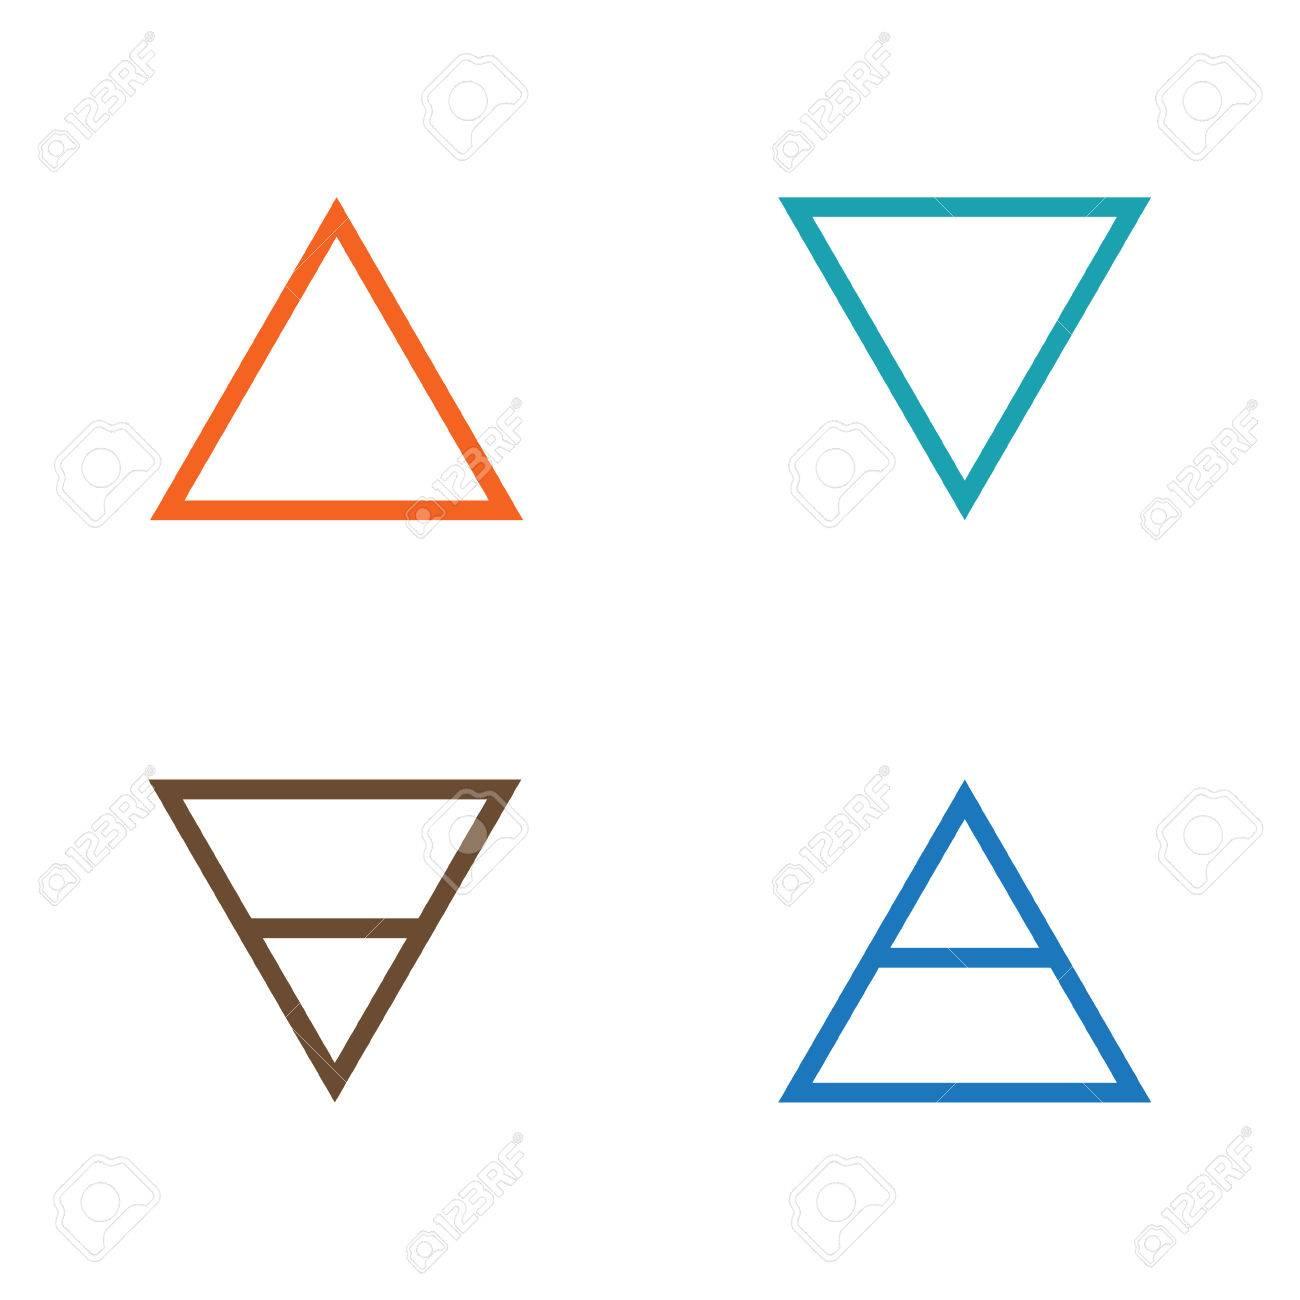 Vector Illustration Four Elements Icons Line Symbols Air